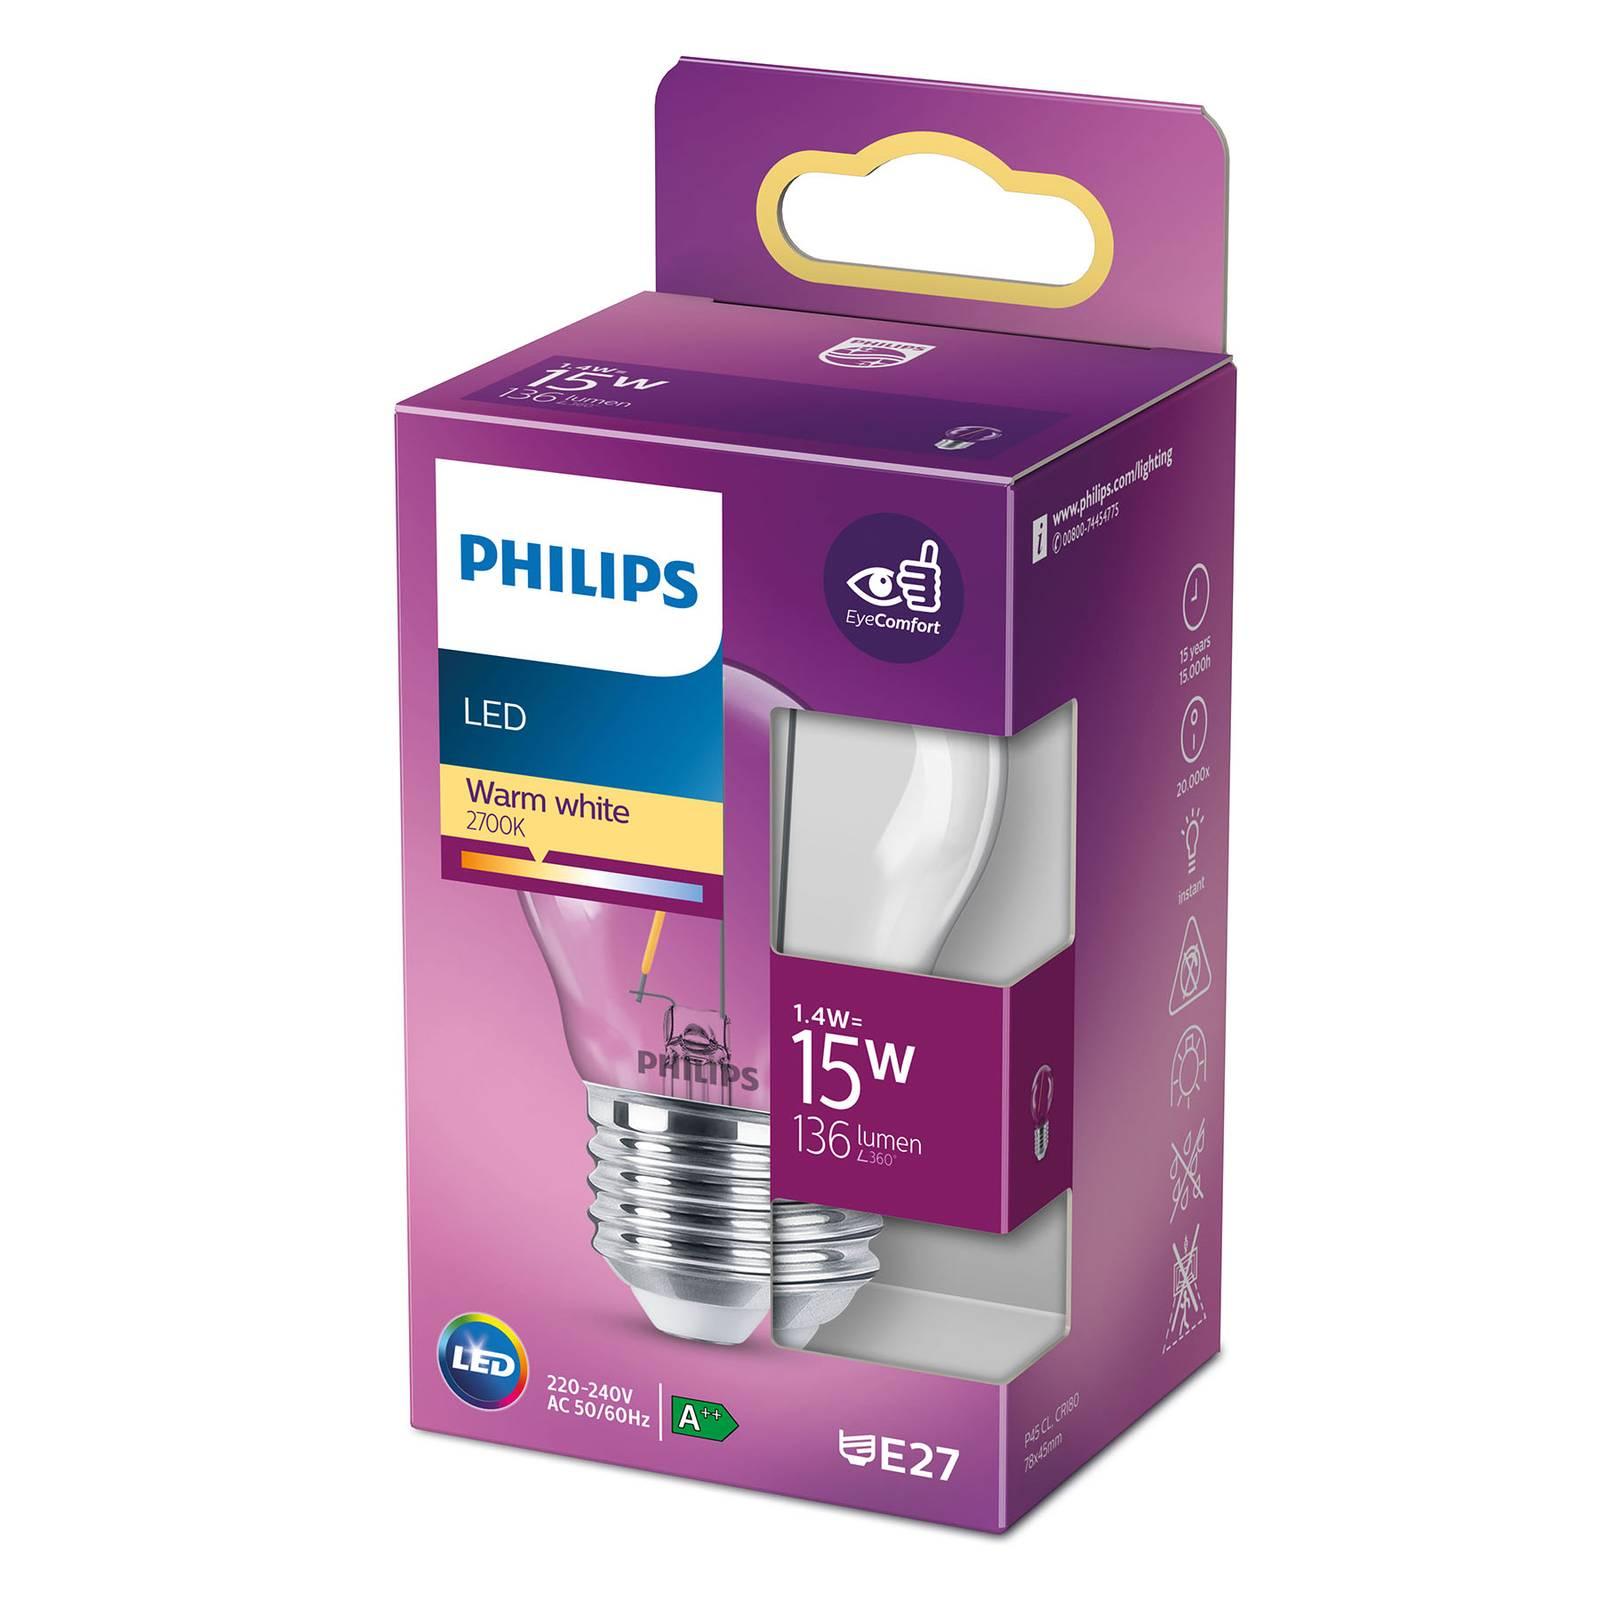 Philips LED Classic pisaralamppu E27 P45 1,4W